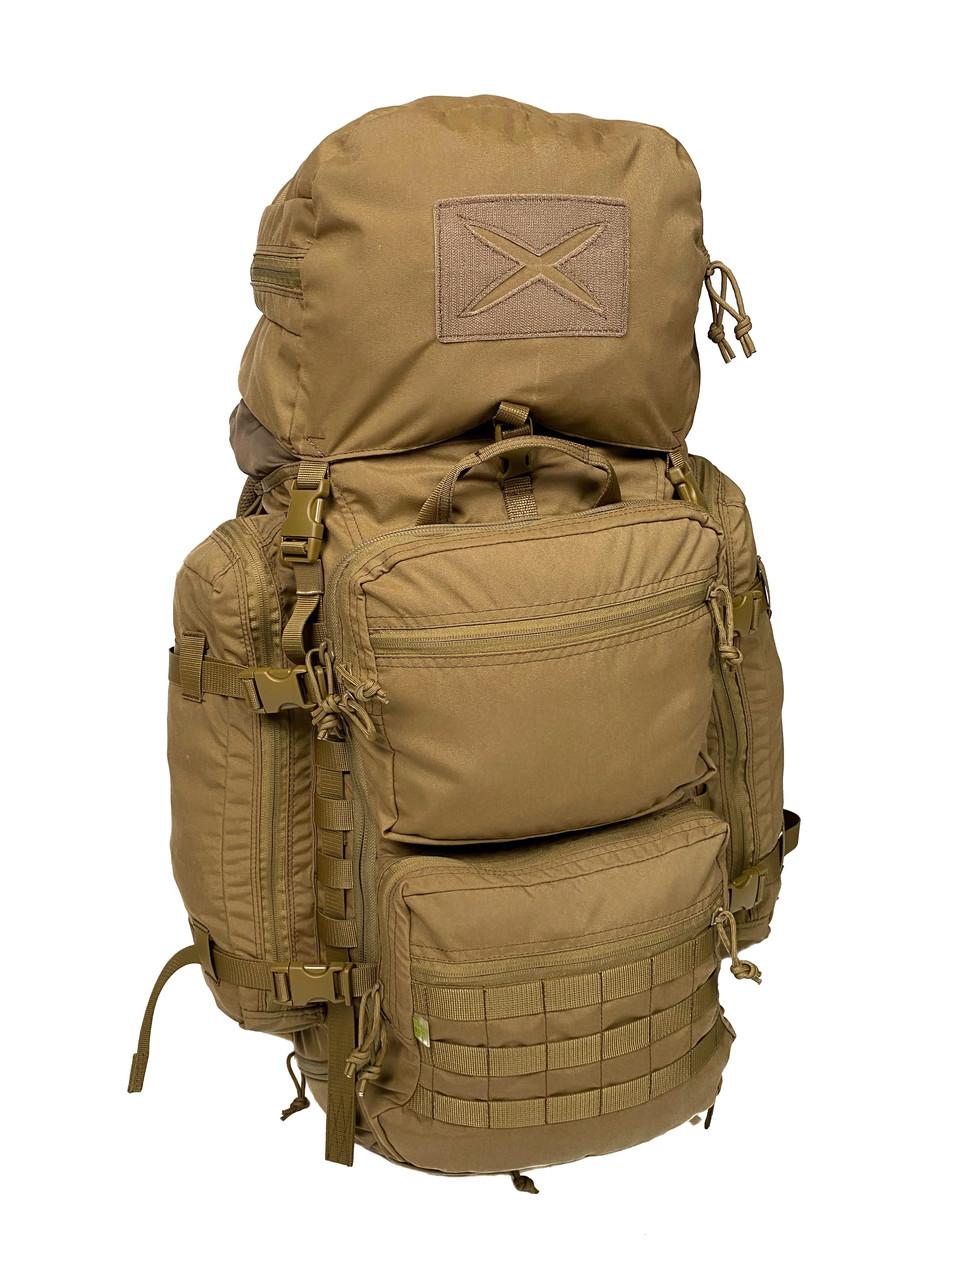 Тактический рюкзак M9 Evo Patrol Coyote